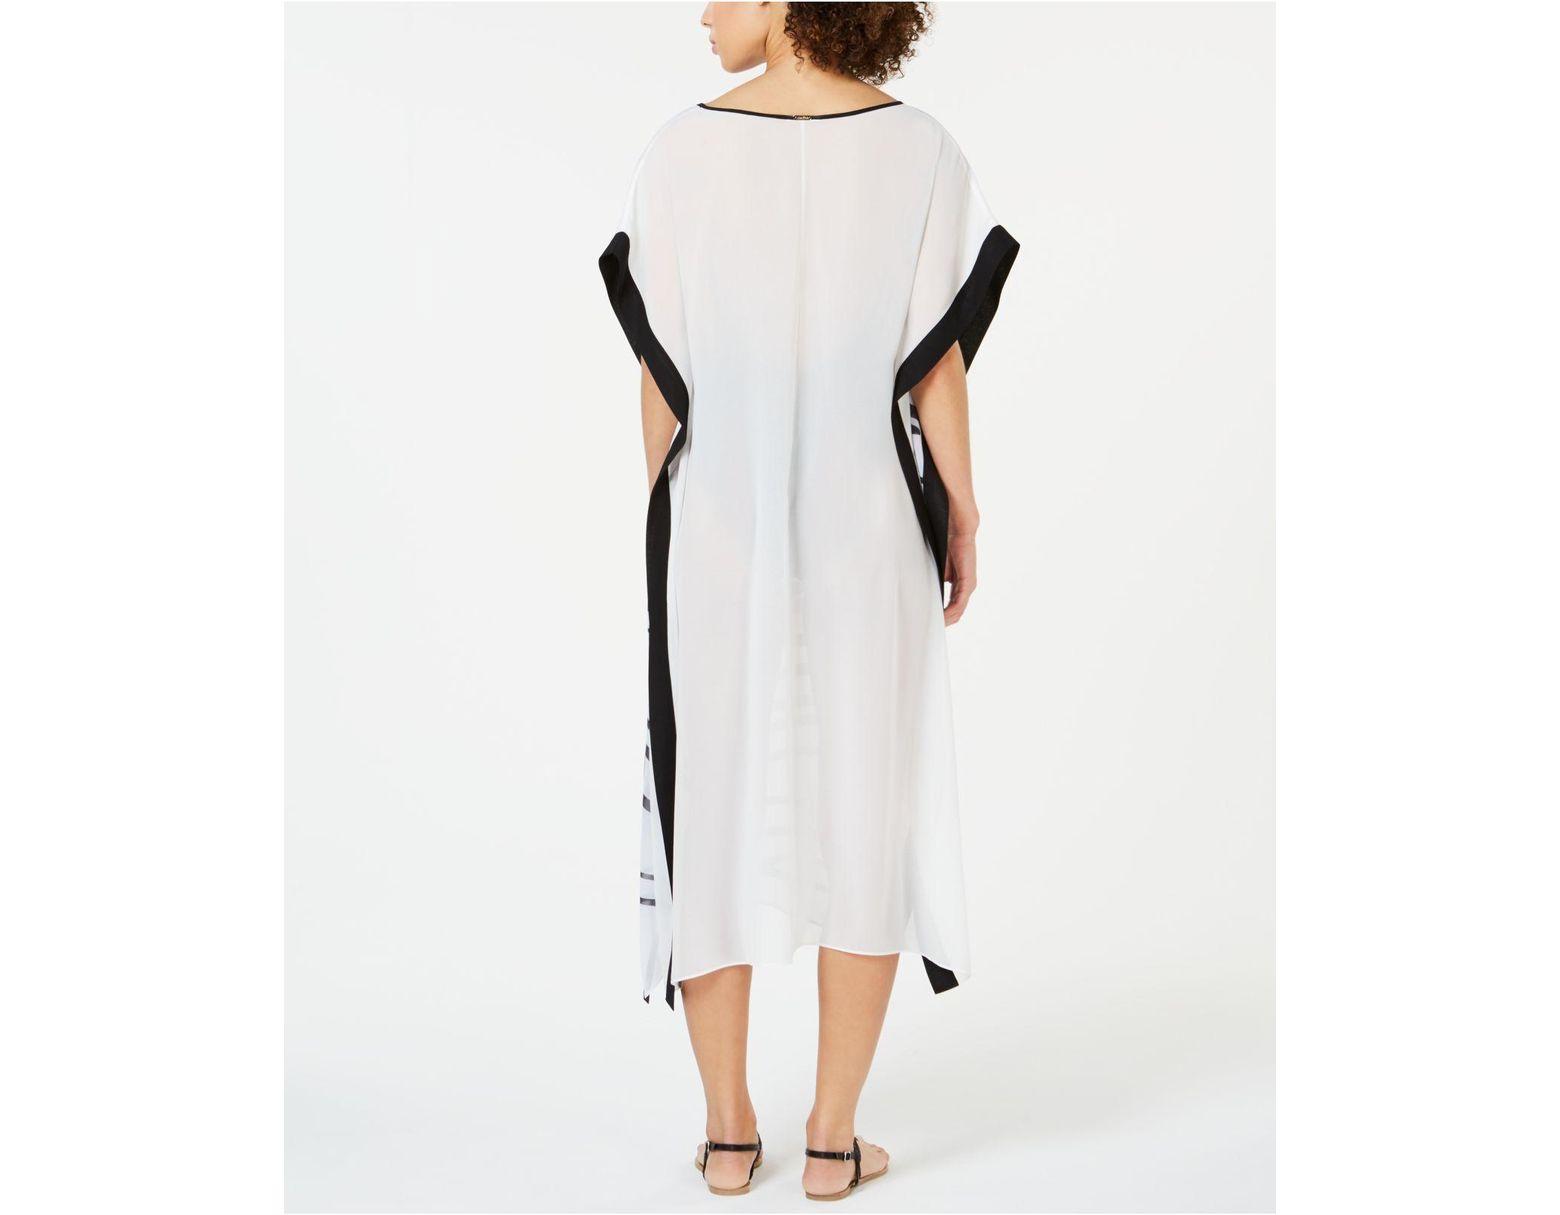 900b4349b4 Calvin Klein Printed Kaftan Cover-up in White - Lyst